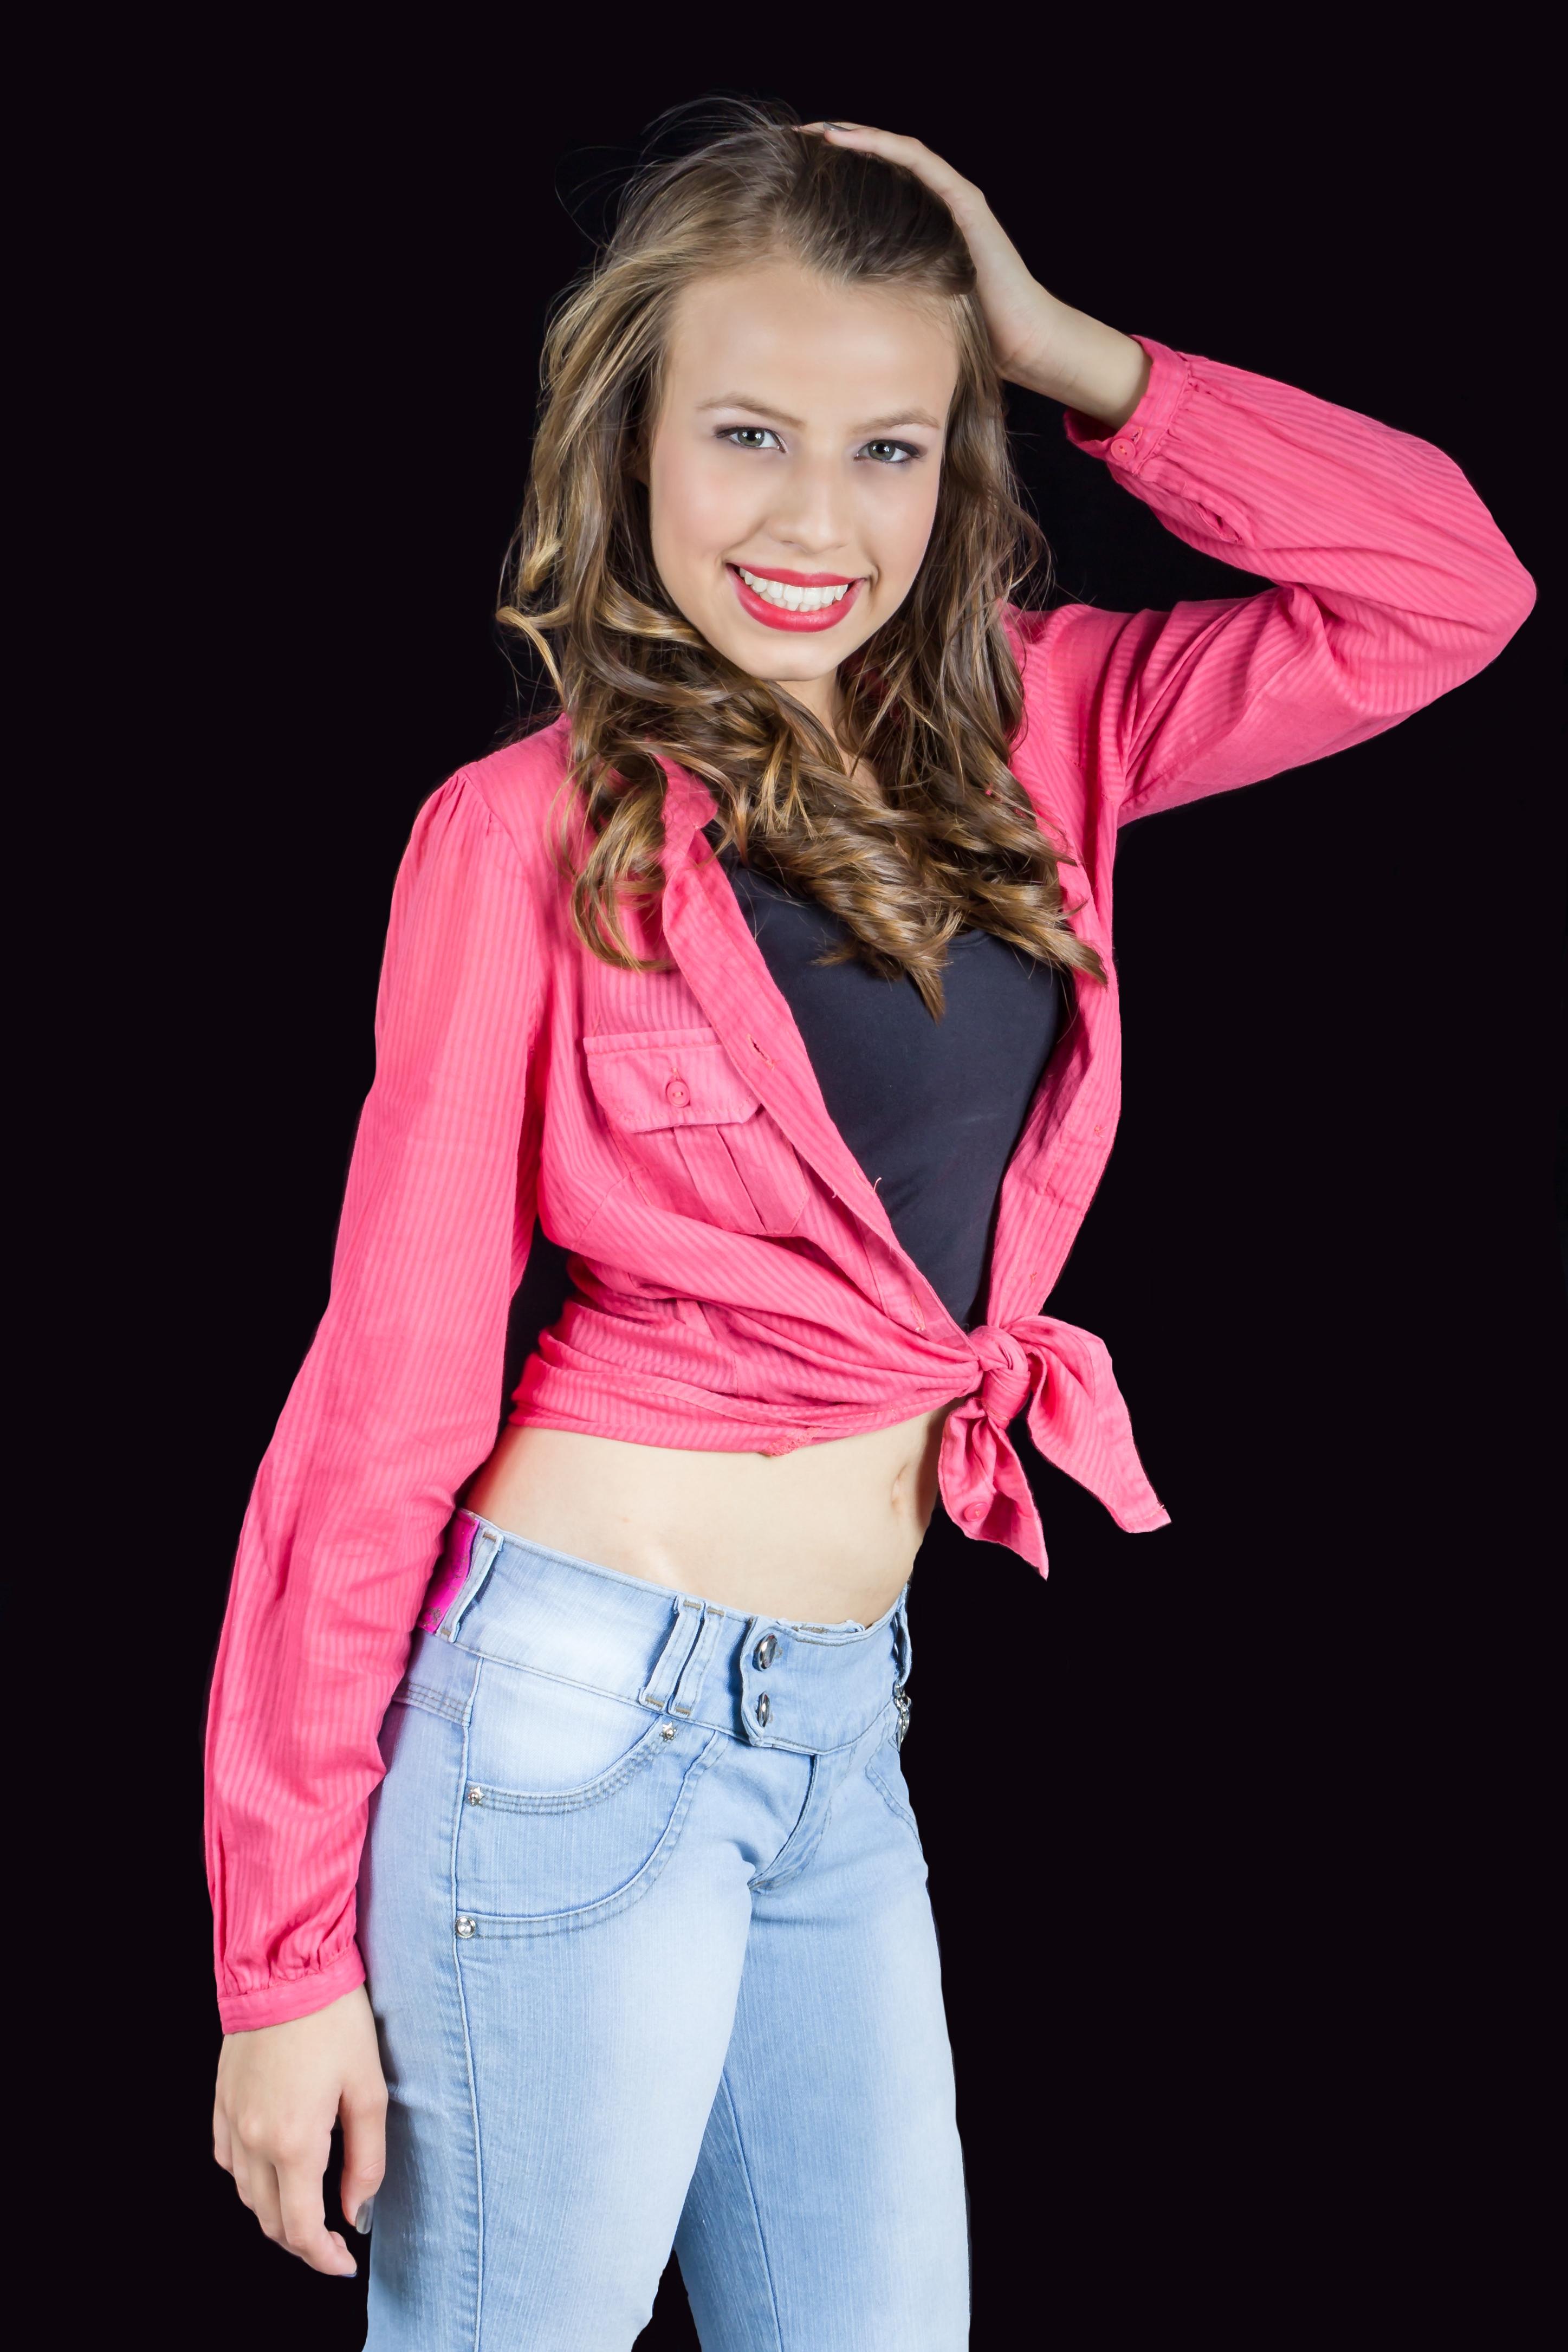 Cassia Bettanin